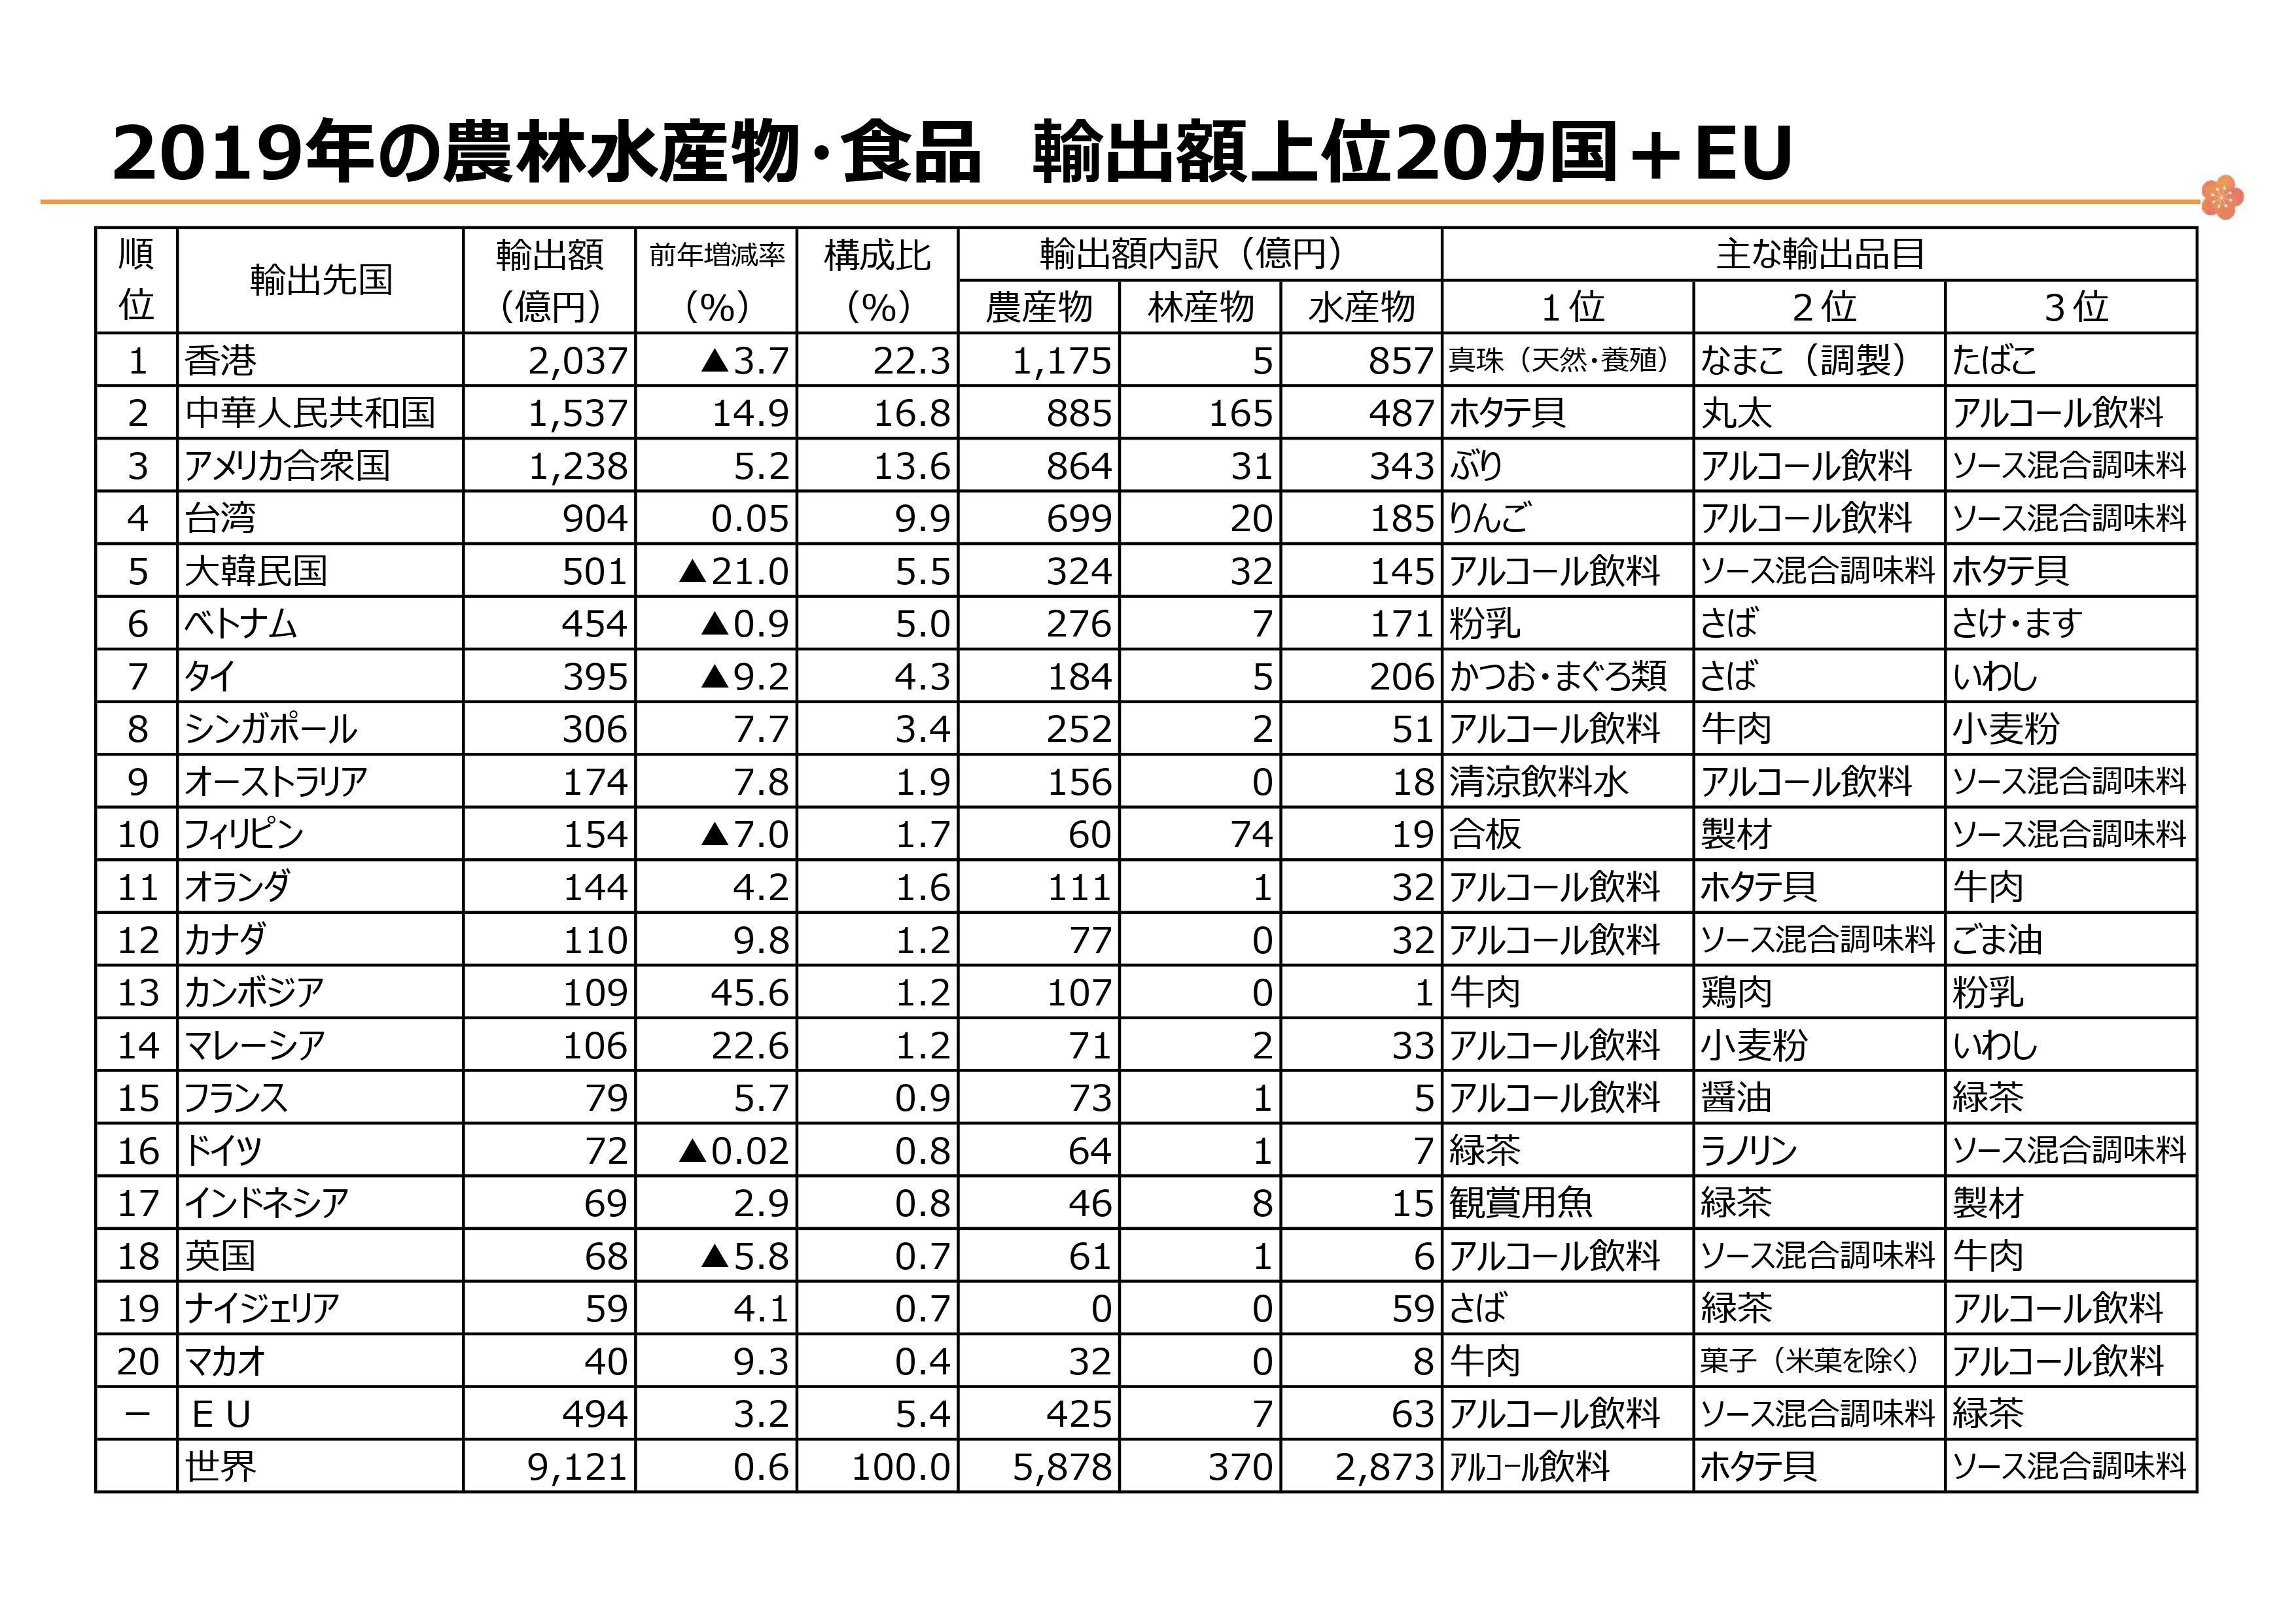 出展:農林水産省 www.maff.go.jp/j/shokusan/export/e_info/attach/pdf/zisseki-225.pdf